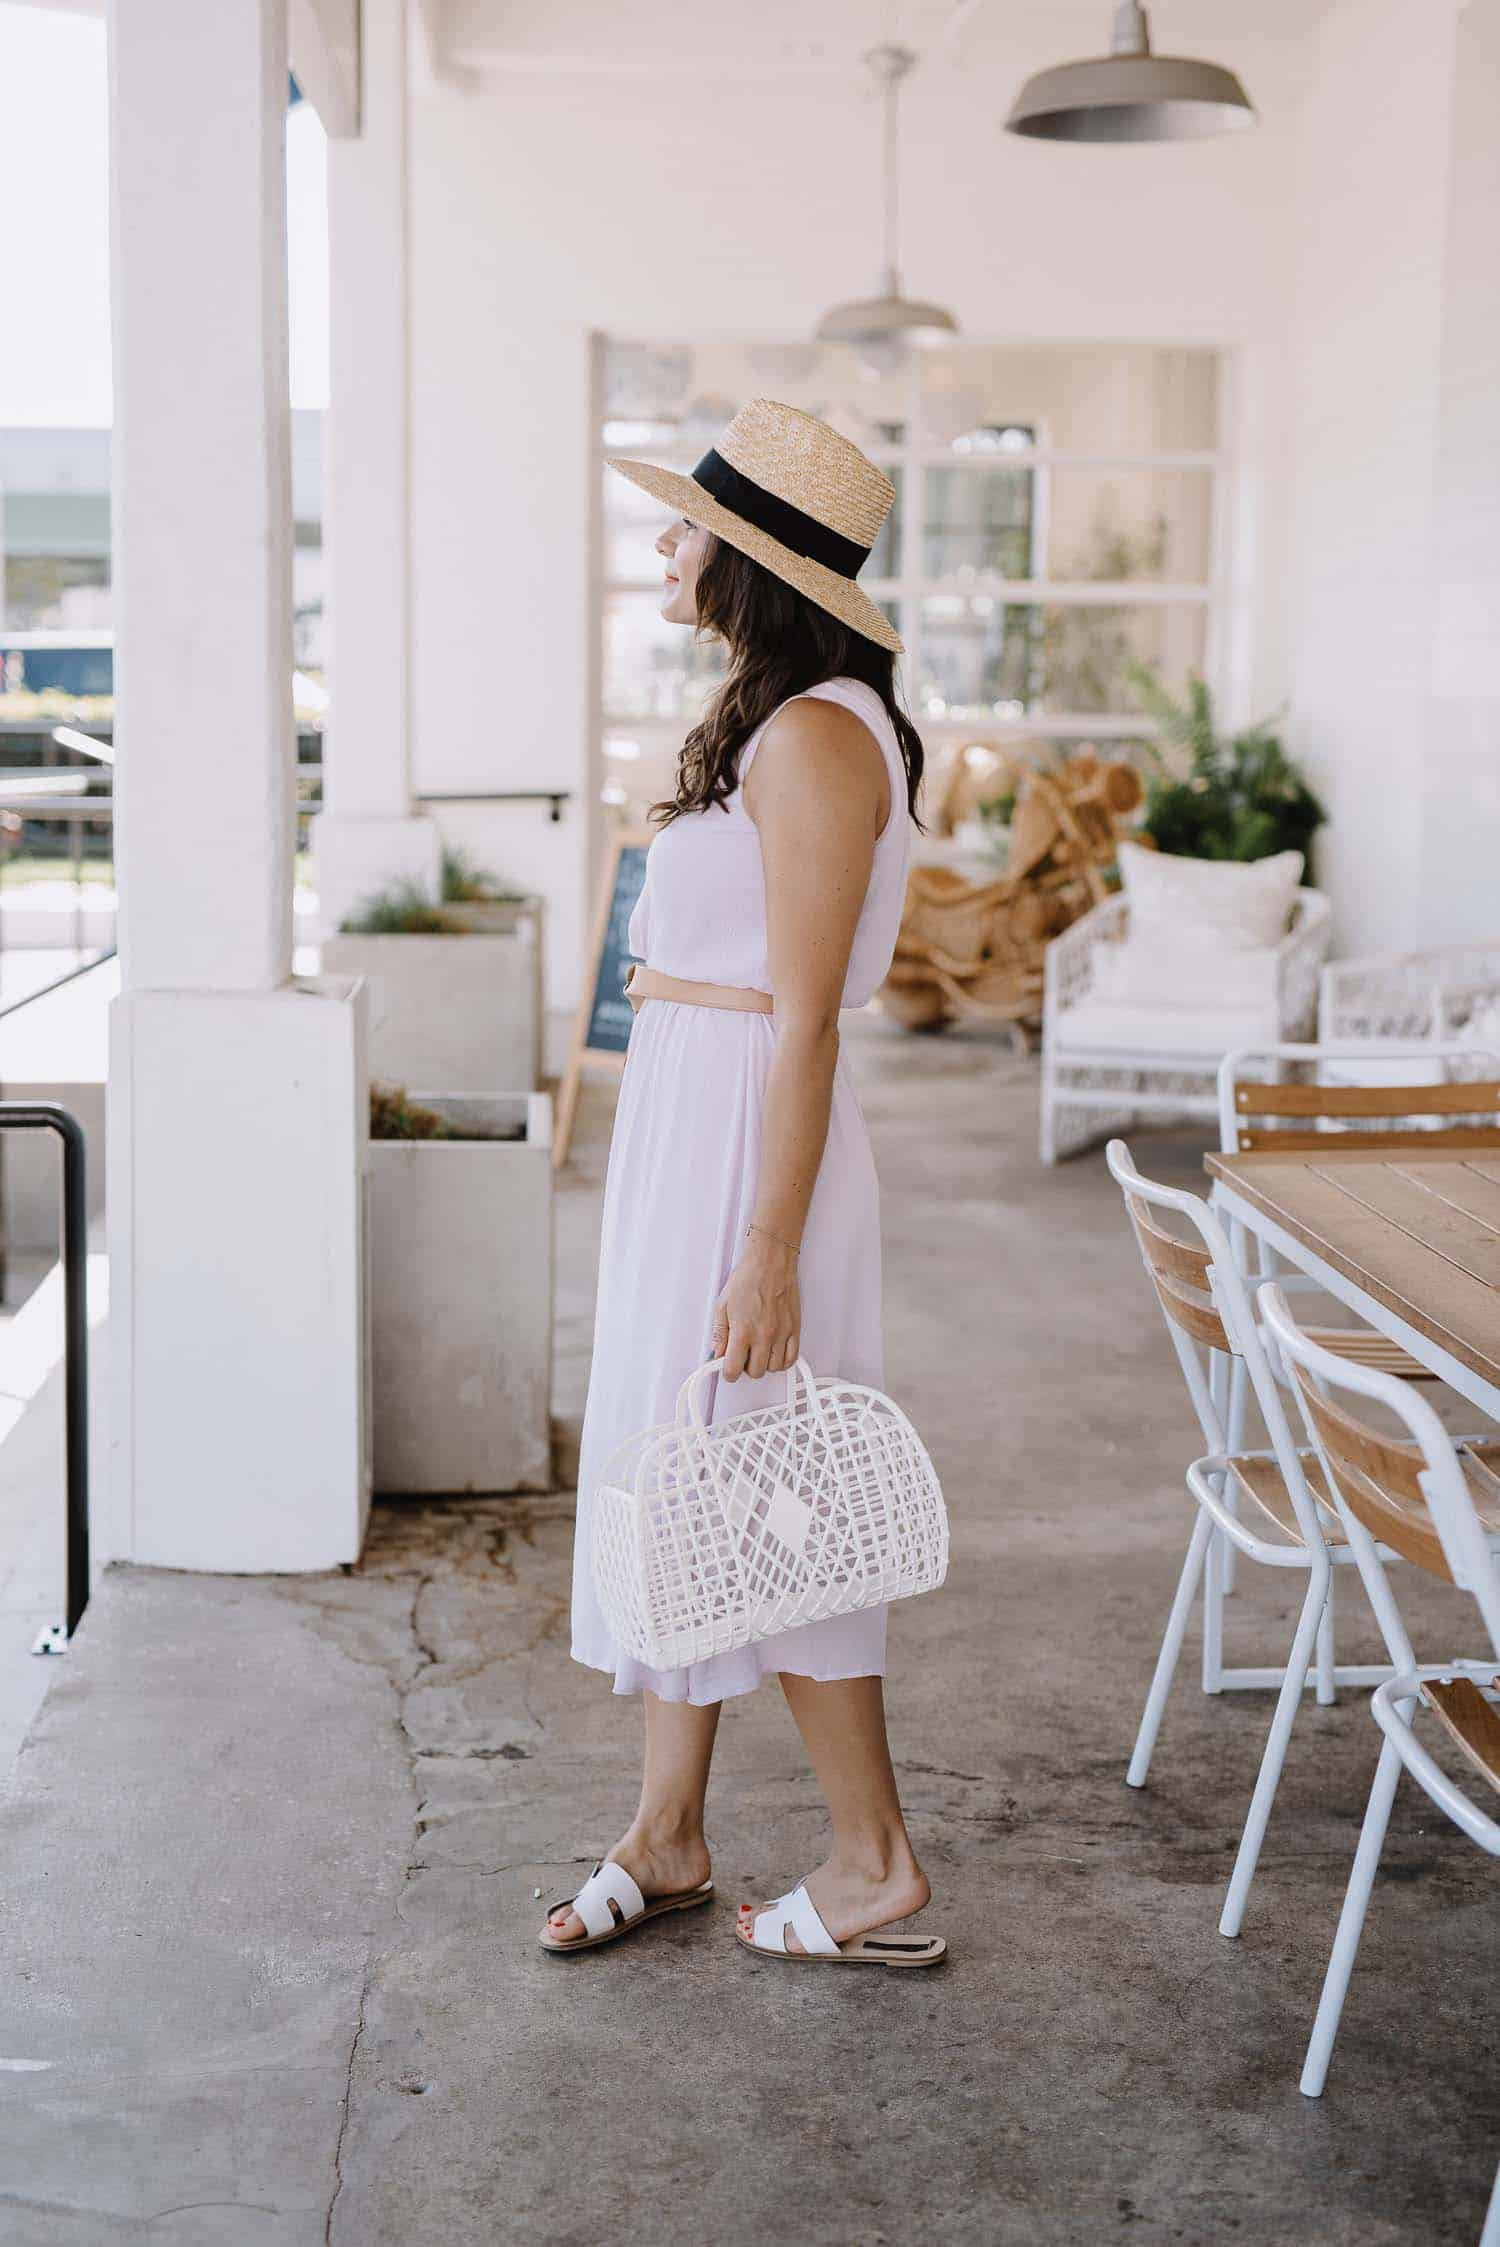 lilac midi dress, summer outfit ideas, straw hat, Atlanta Blogger - My Style Vita